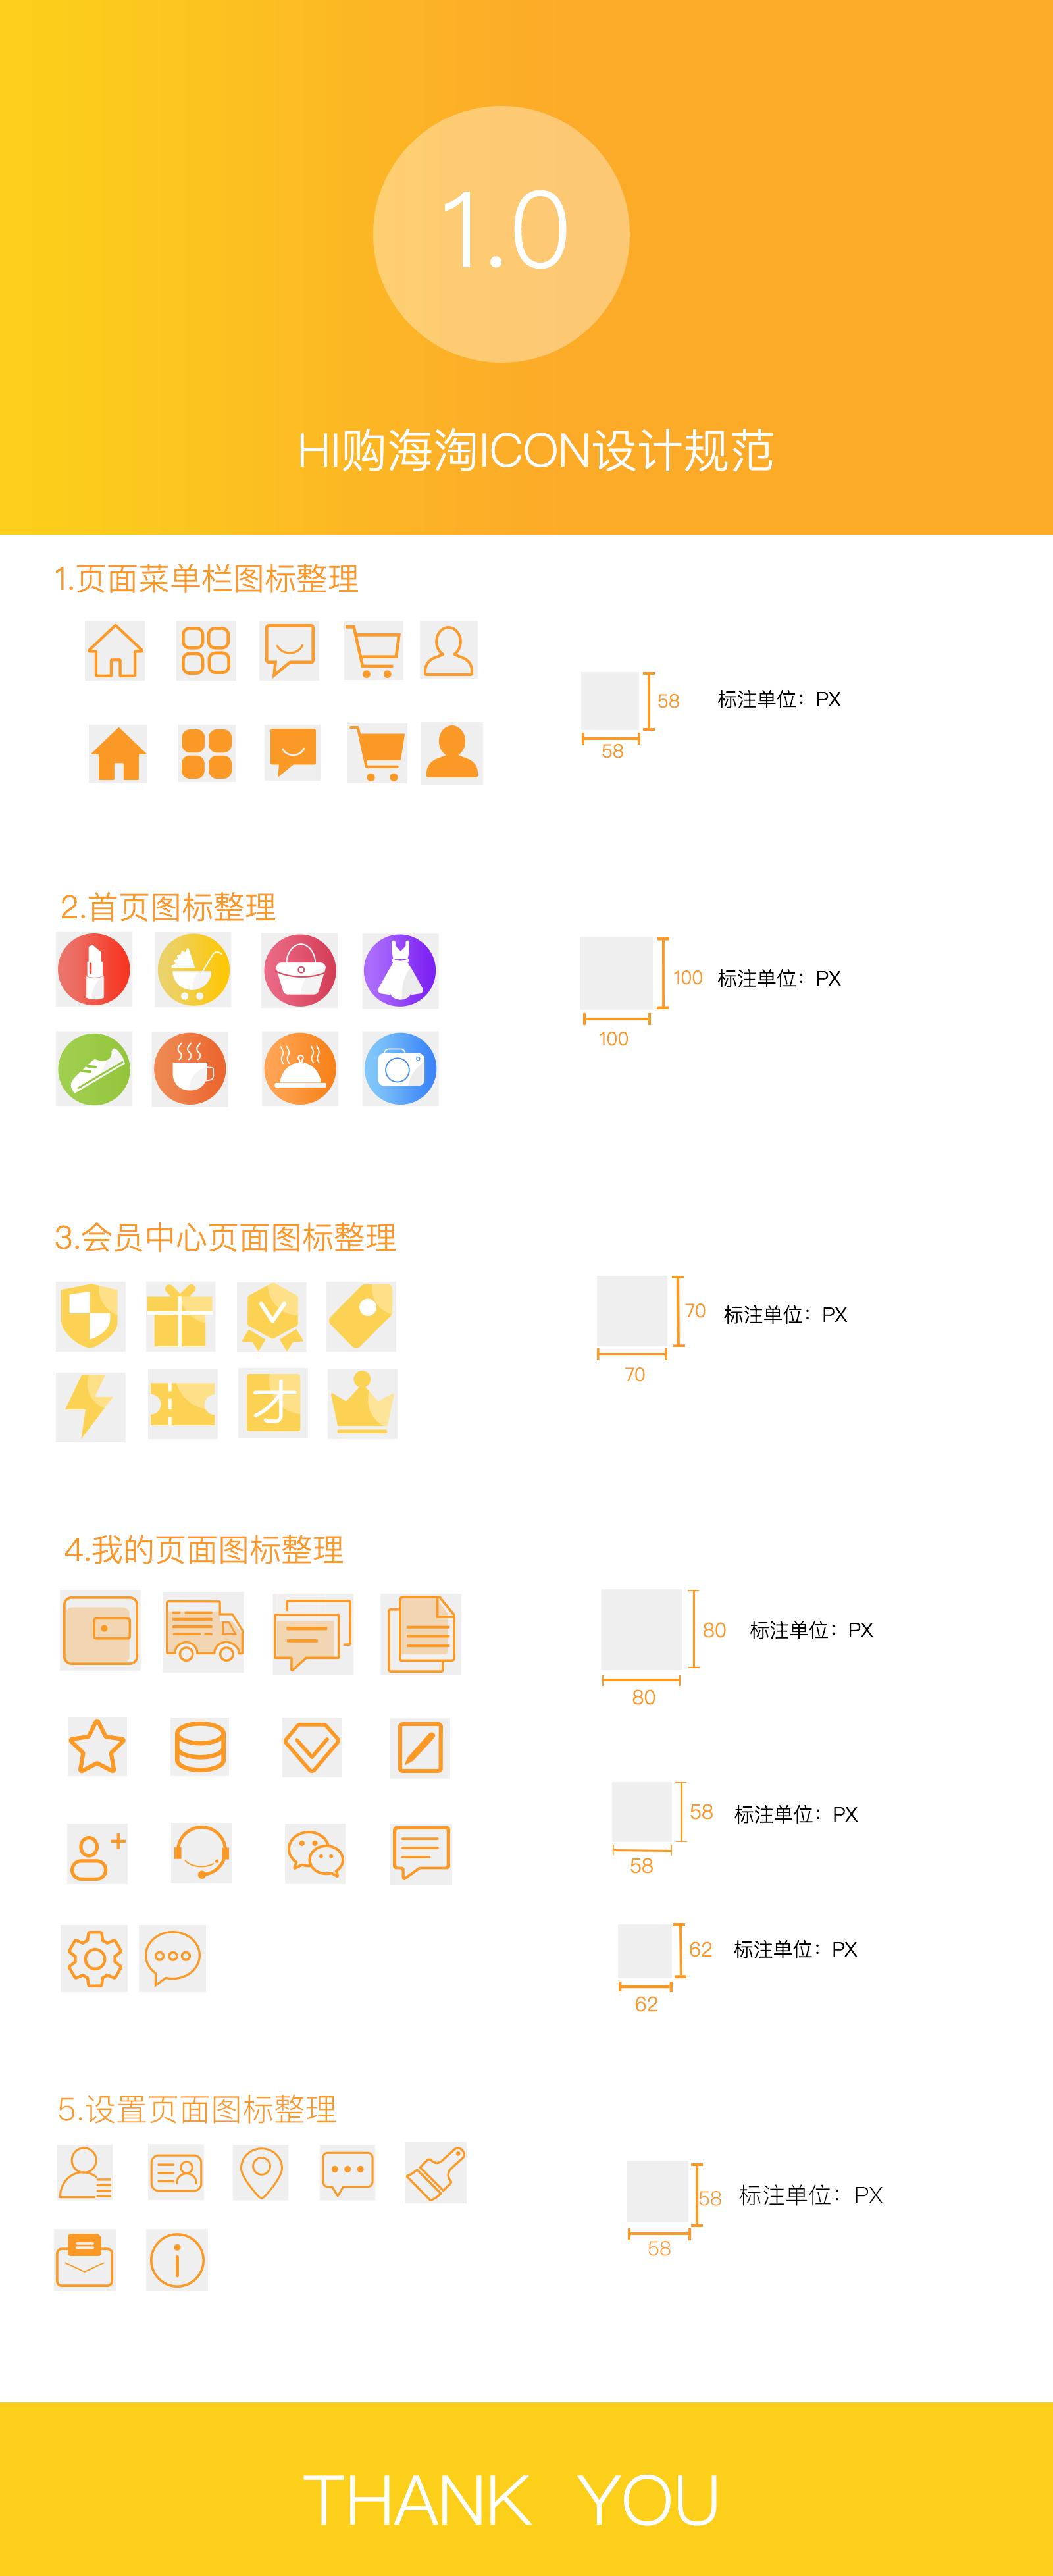 UI小屋v小屋规范图标室内设计图片